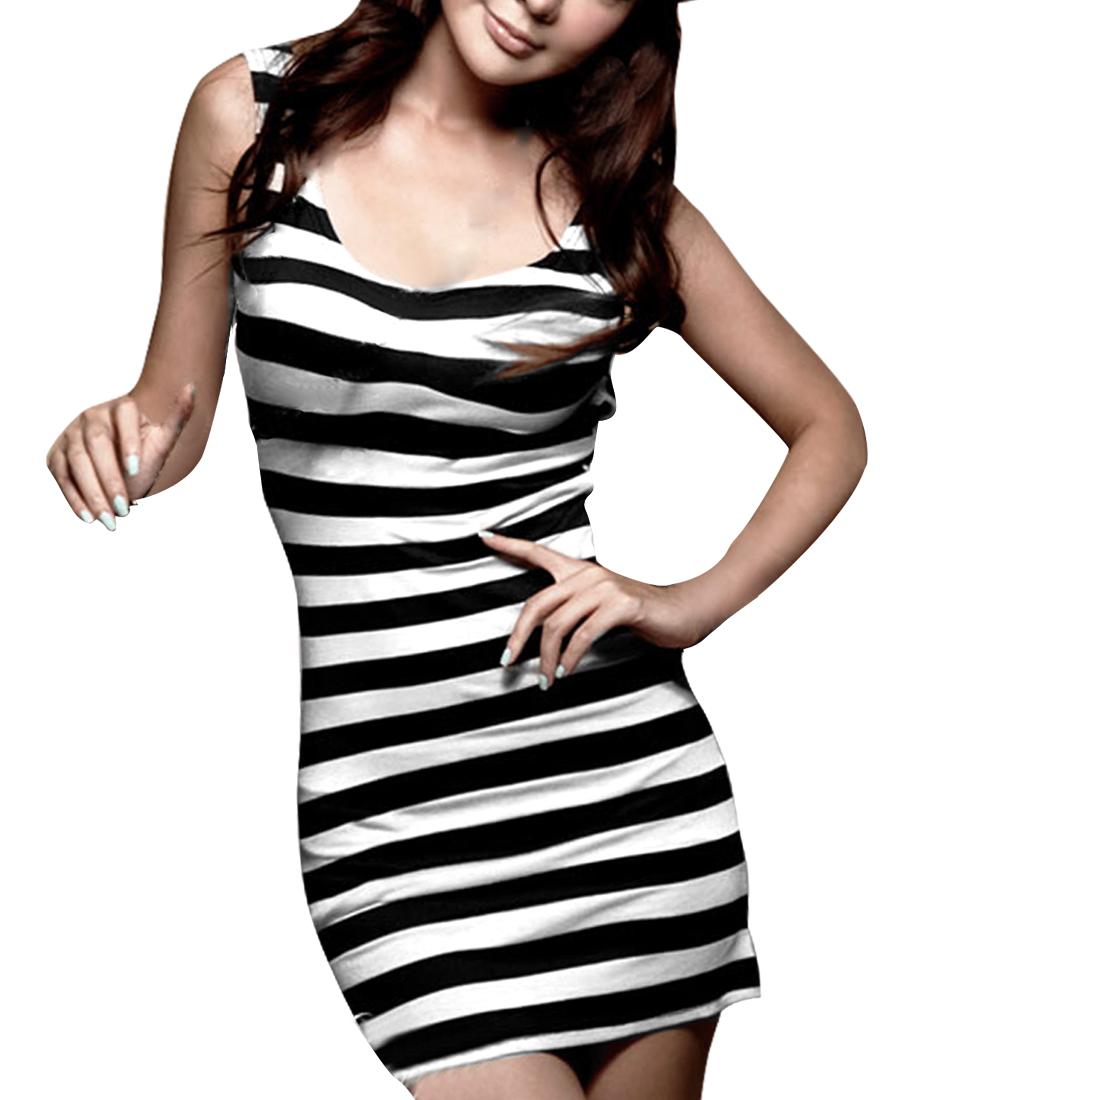 Allegra K Women's Black White Backless Stripes Pullover Slim Fit Tank Dress (Size L / 12)